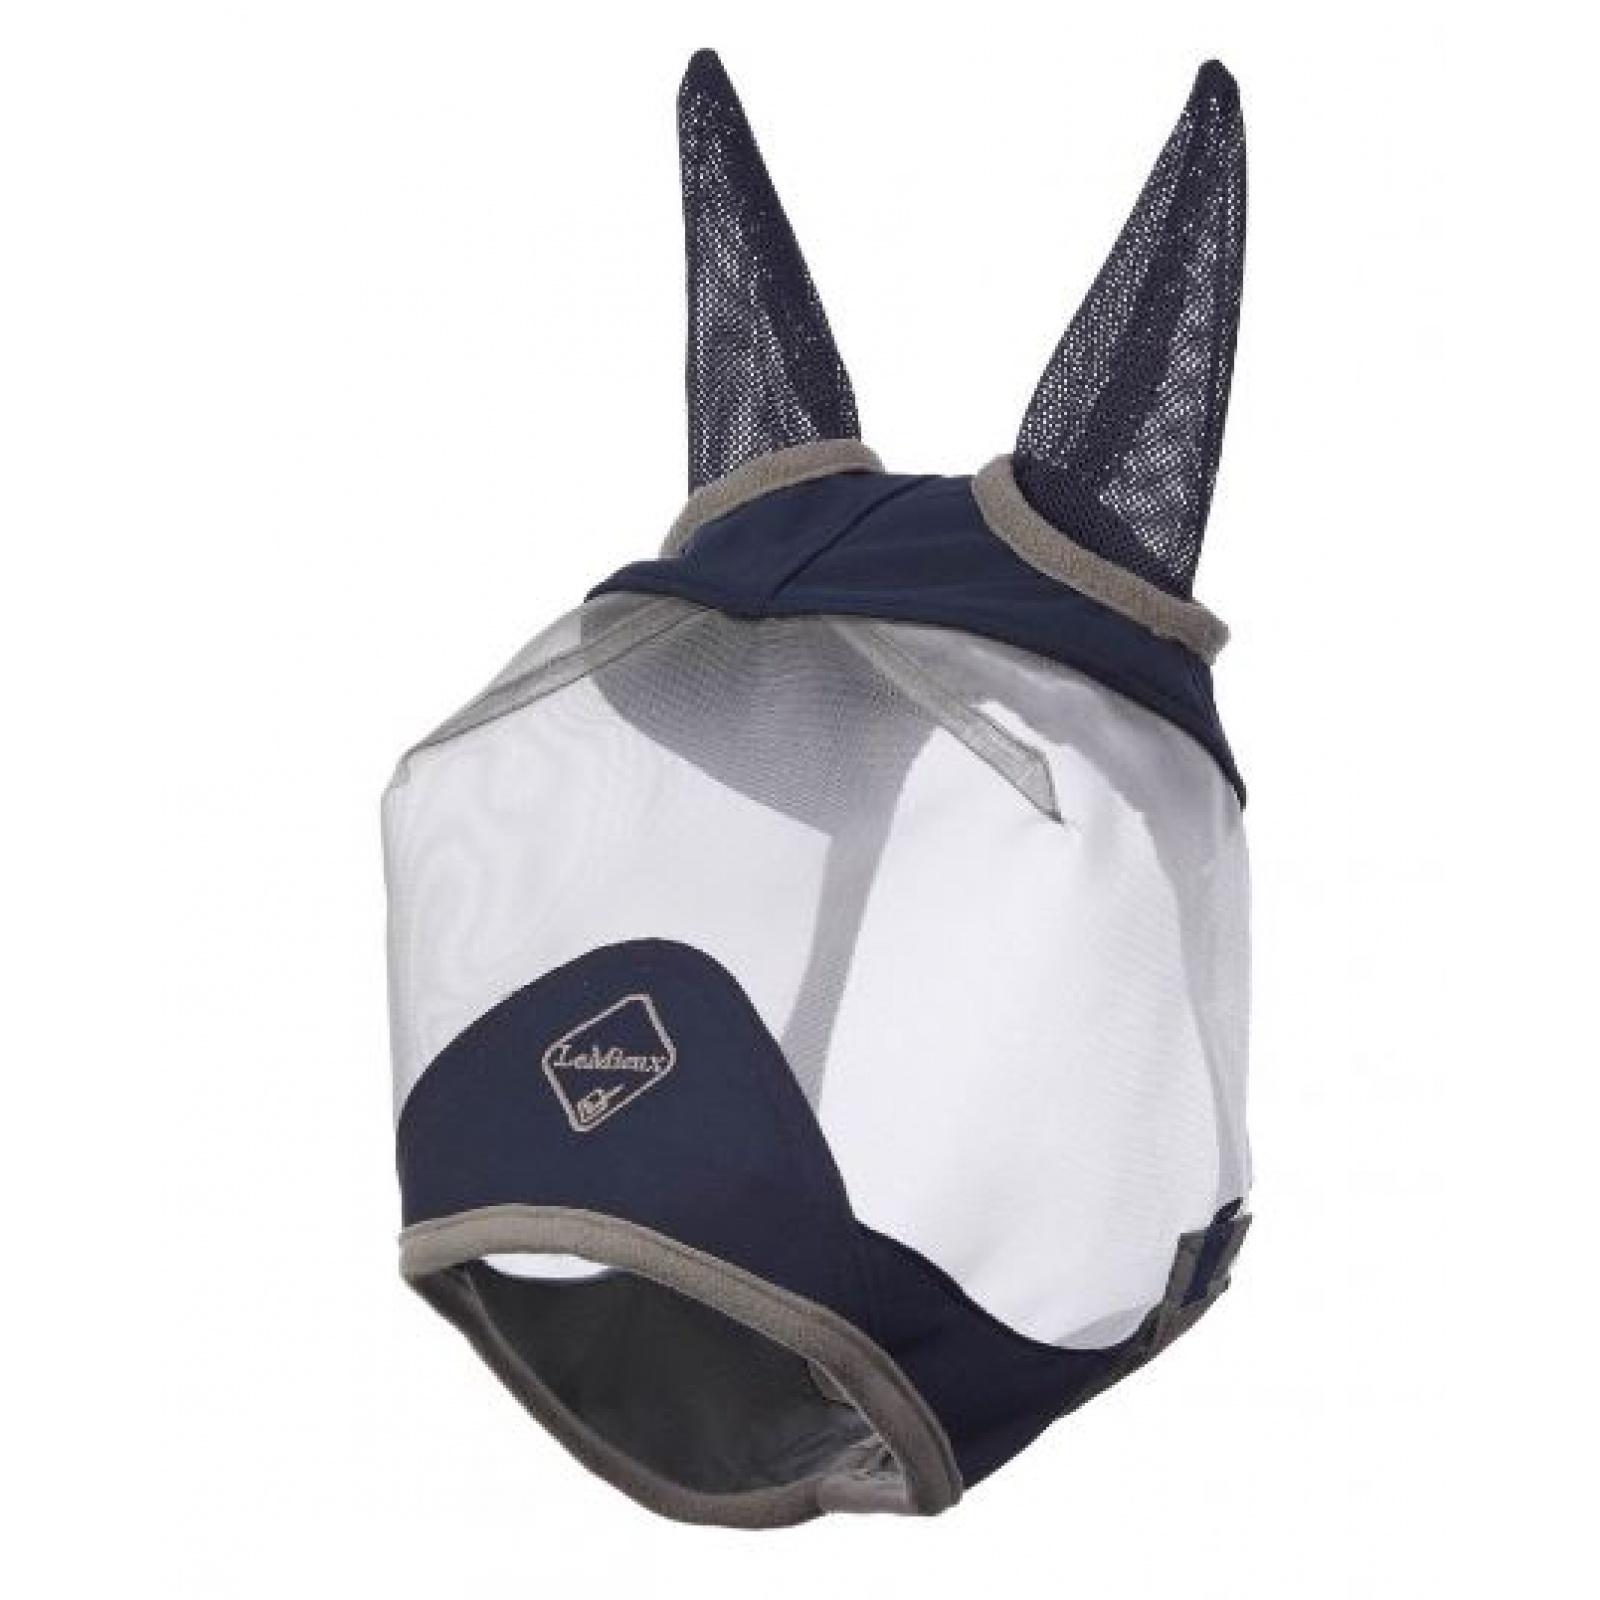 LeMieux-Armour-Shield-Fly-Protector-Mask thumbnail 11